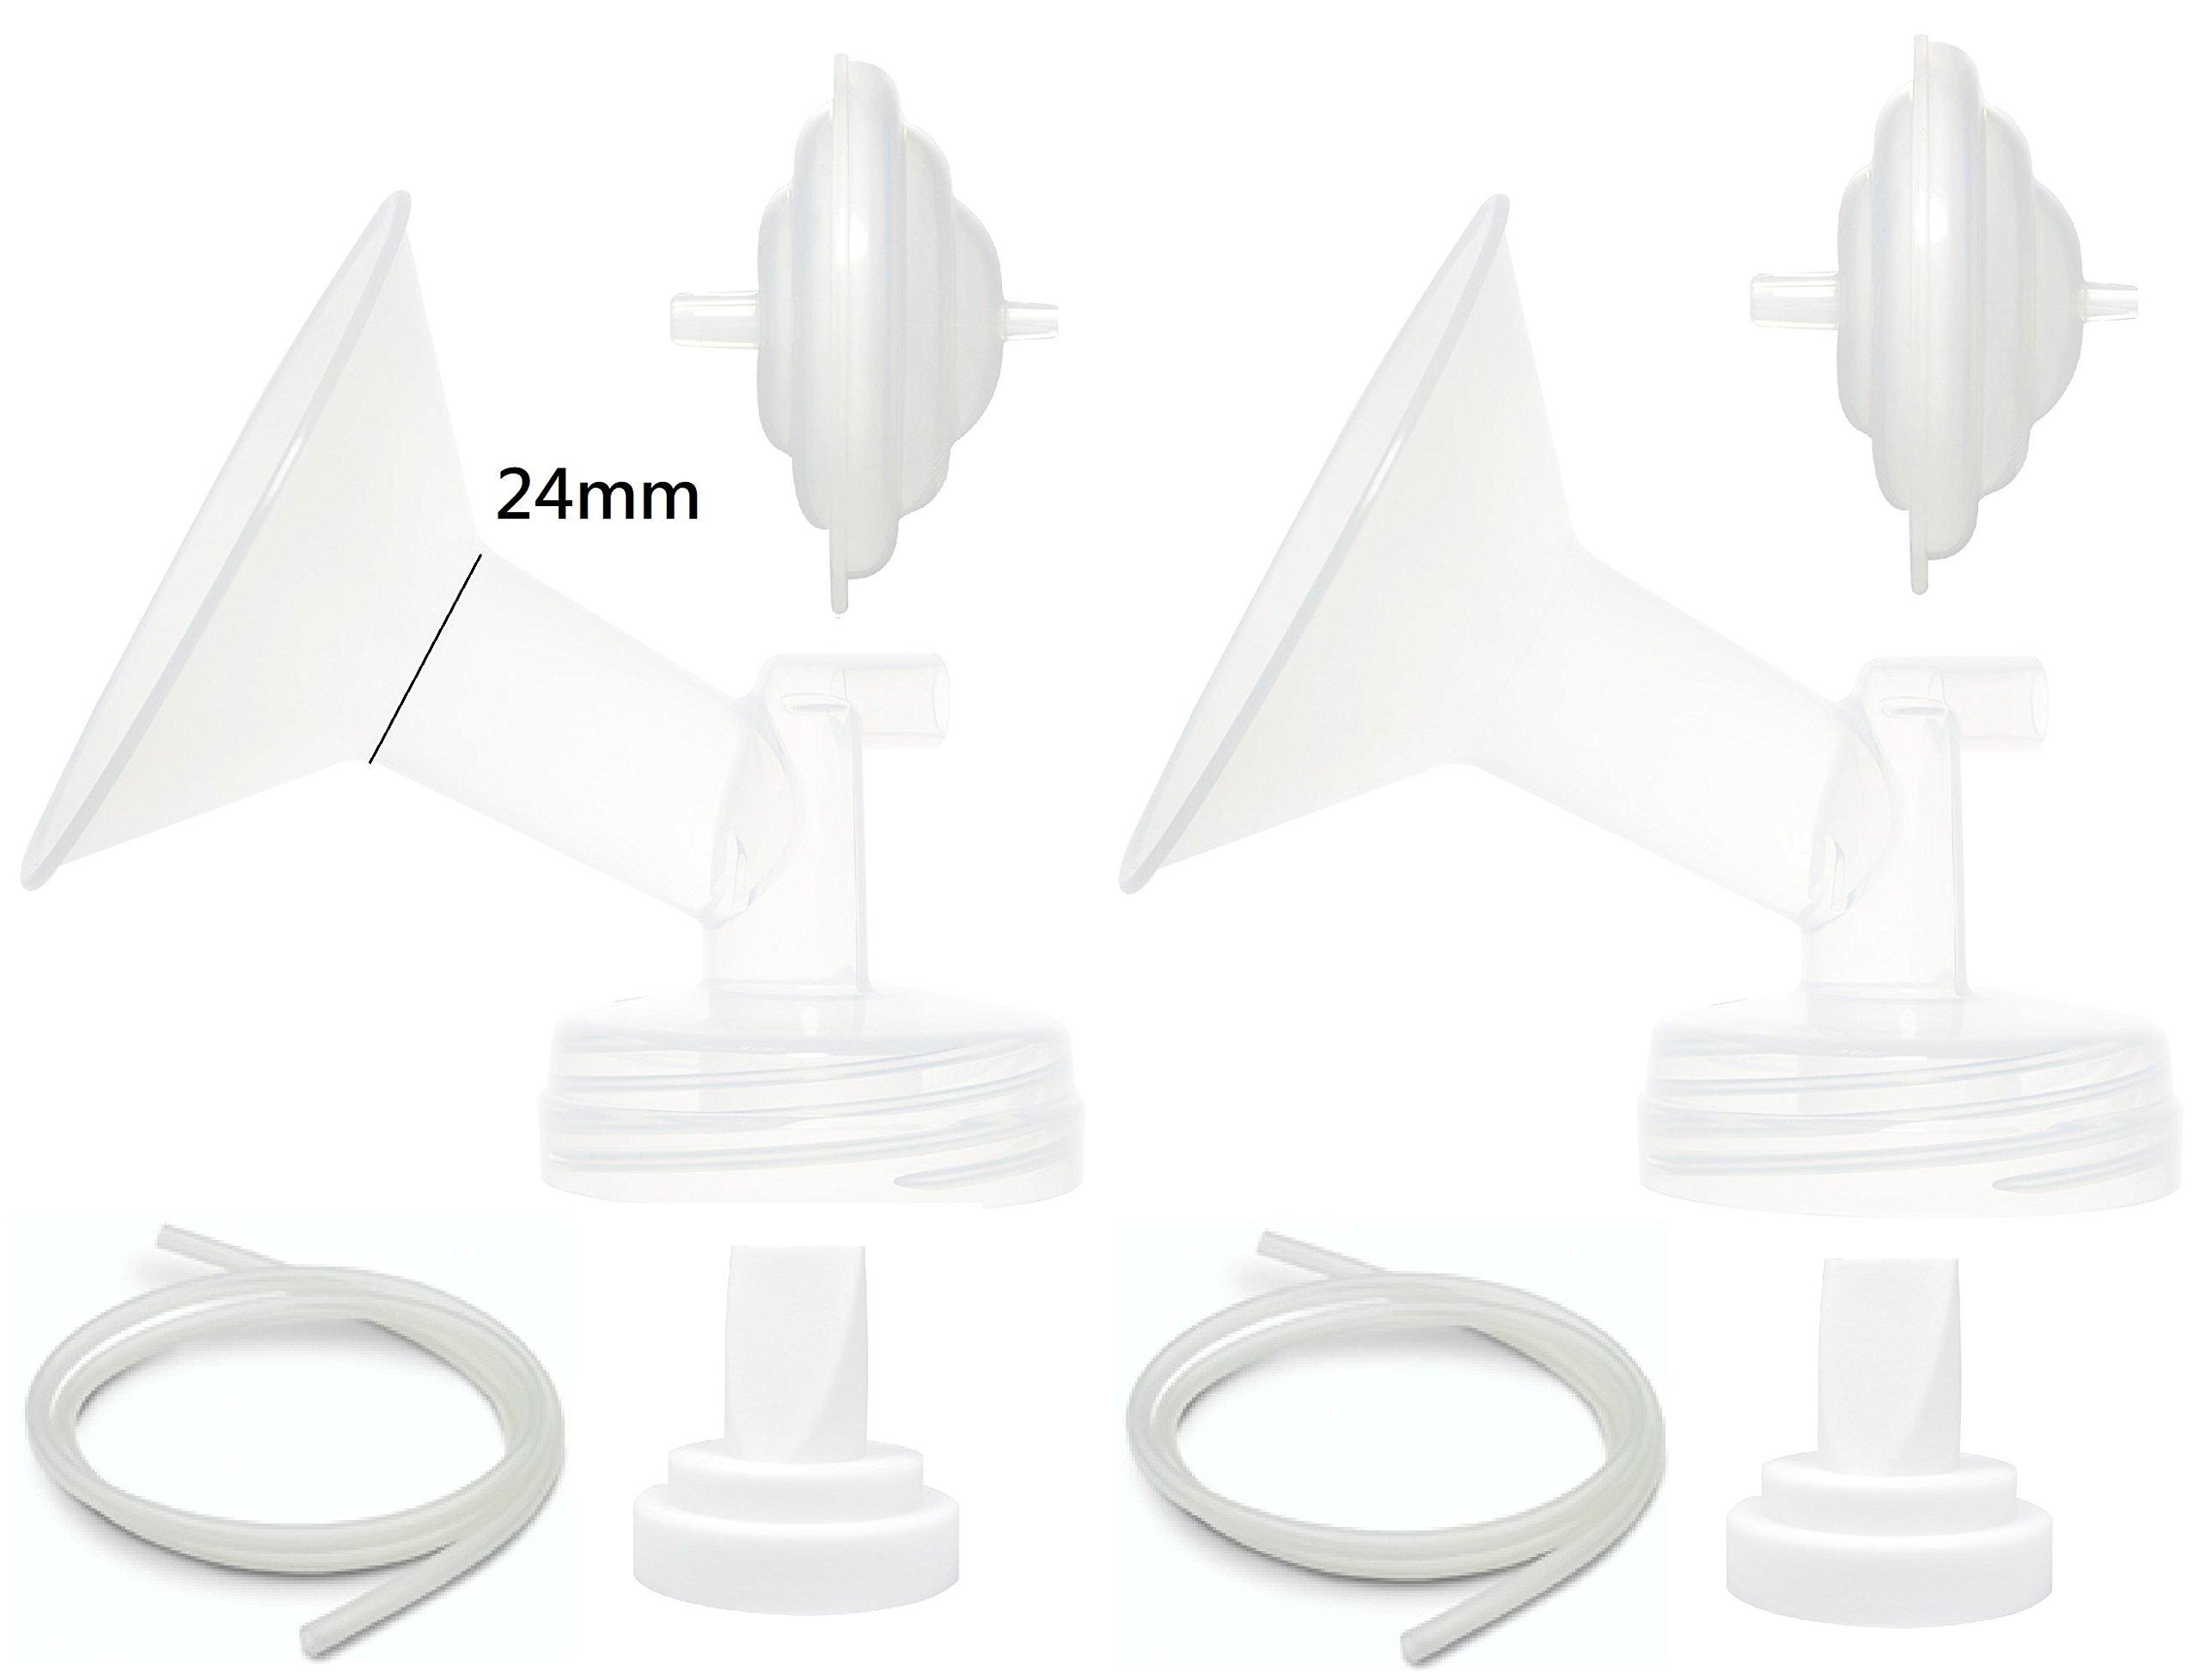 Nenesupply Aftermarket Pump Parts for Spectra S2 Spectra S1 Spectra 9 Plus Breastpump Flange Valve Tubing Backflow Protector Not Original Spectra Parts (Flange 24mm (M))